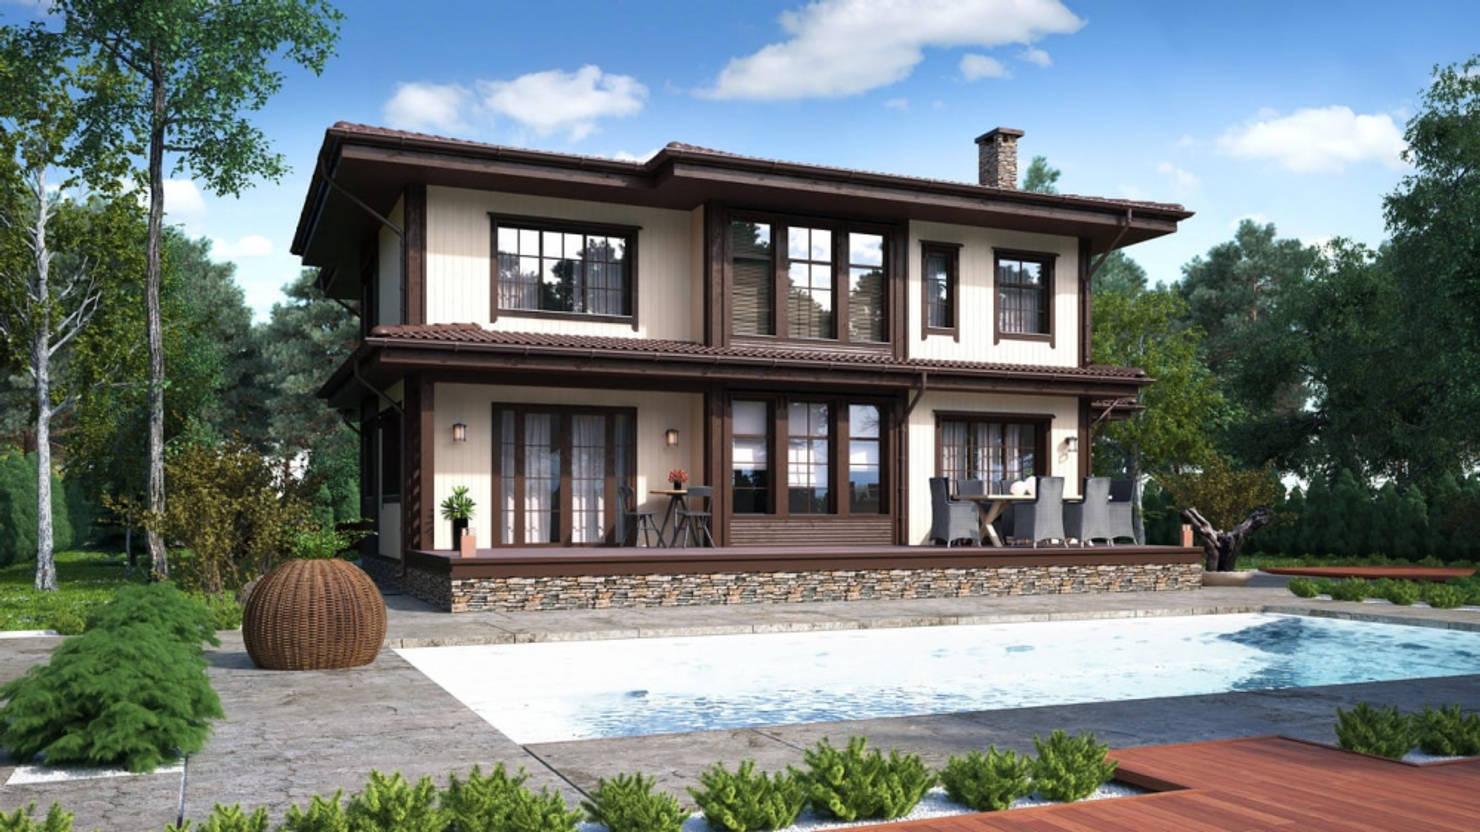 Проект дома с планировкой за 5,1 млн рублей (Москва)